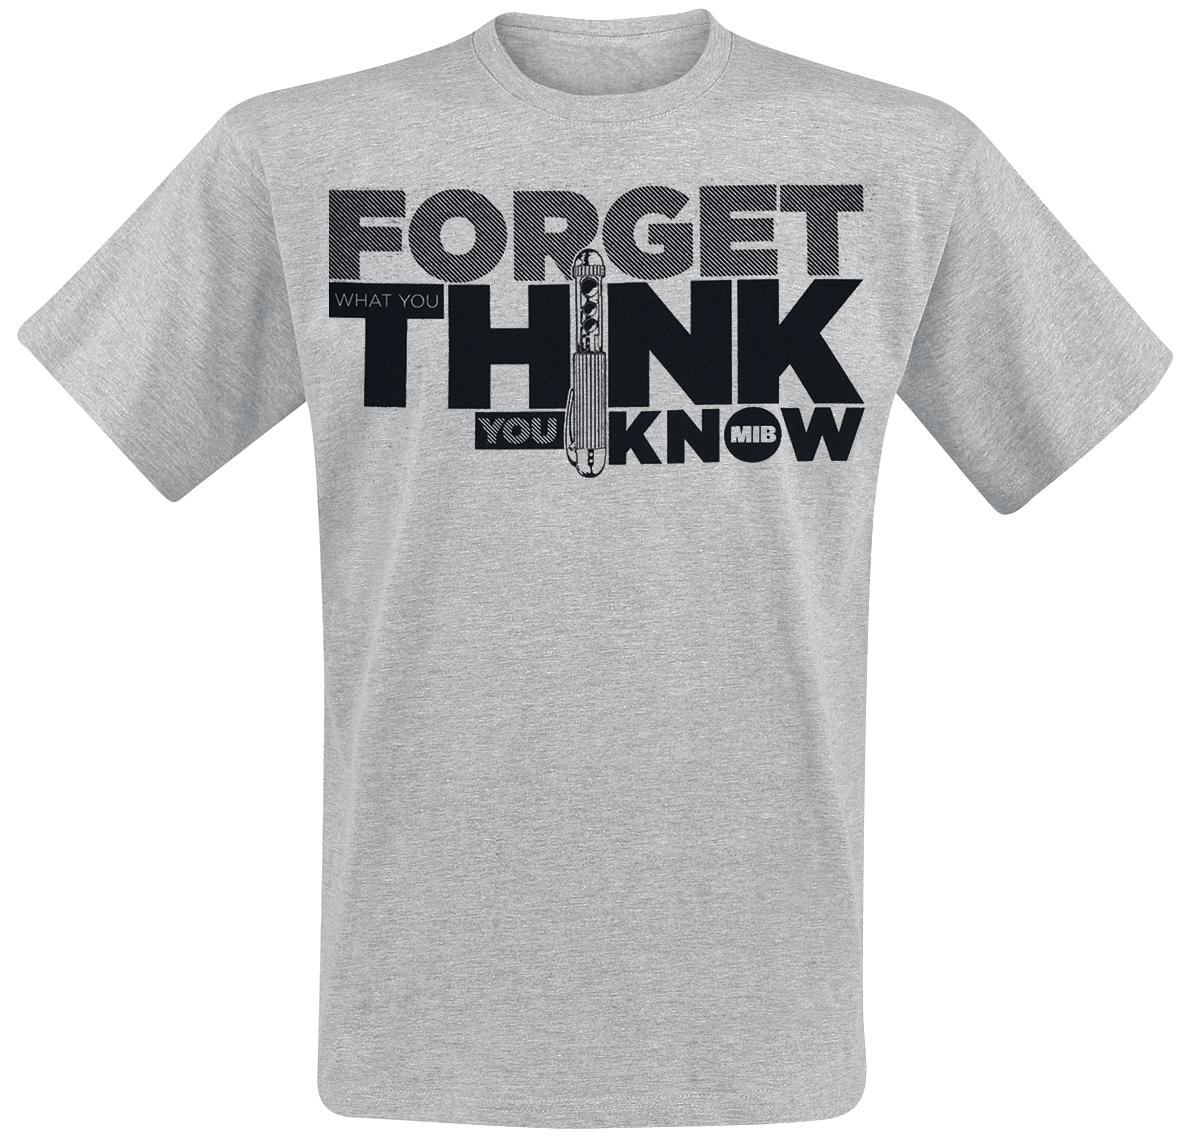 Men in Black - Forget - T-Shirt - grey image